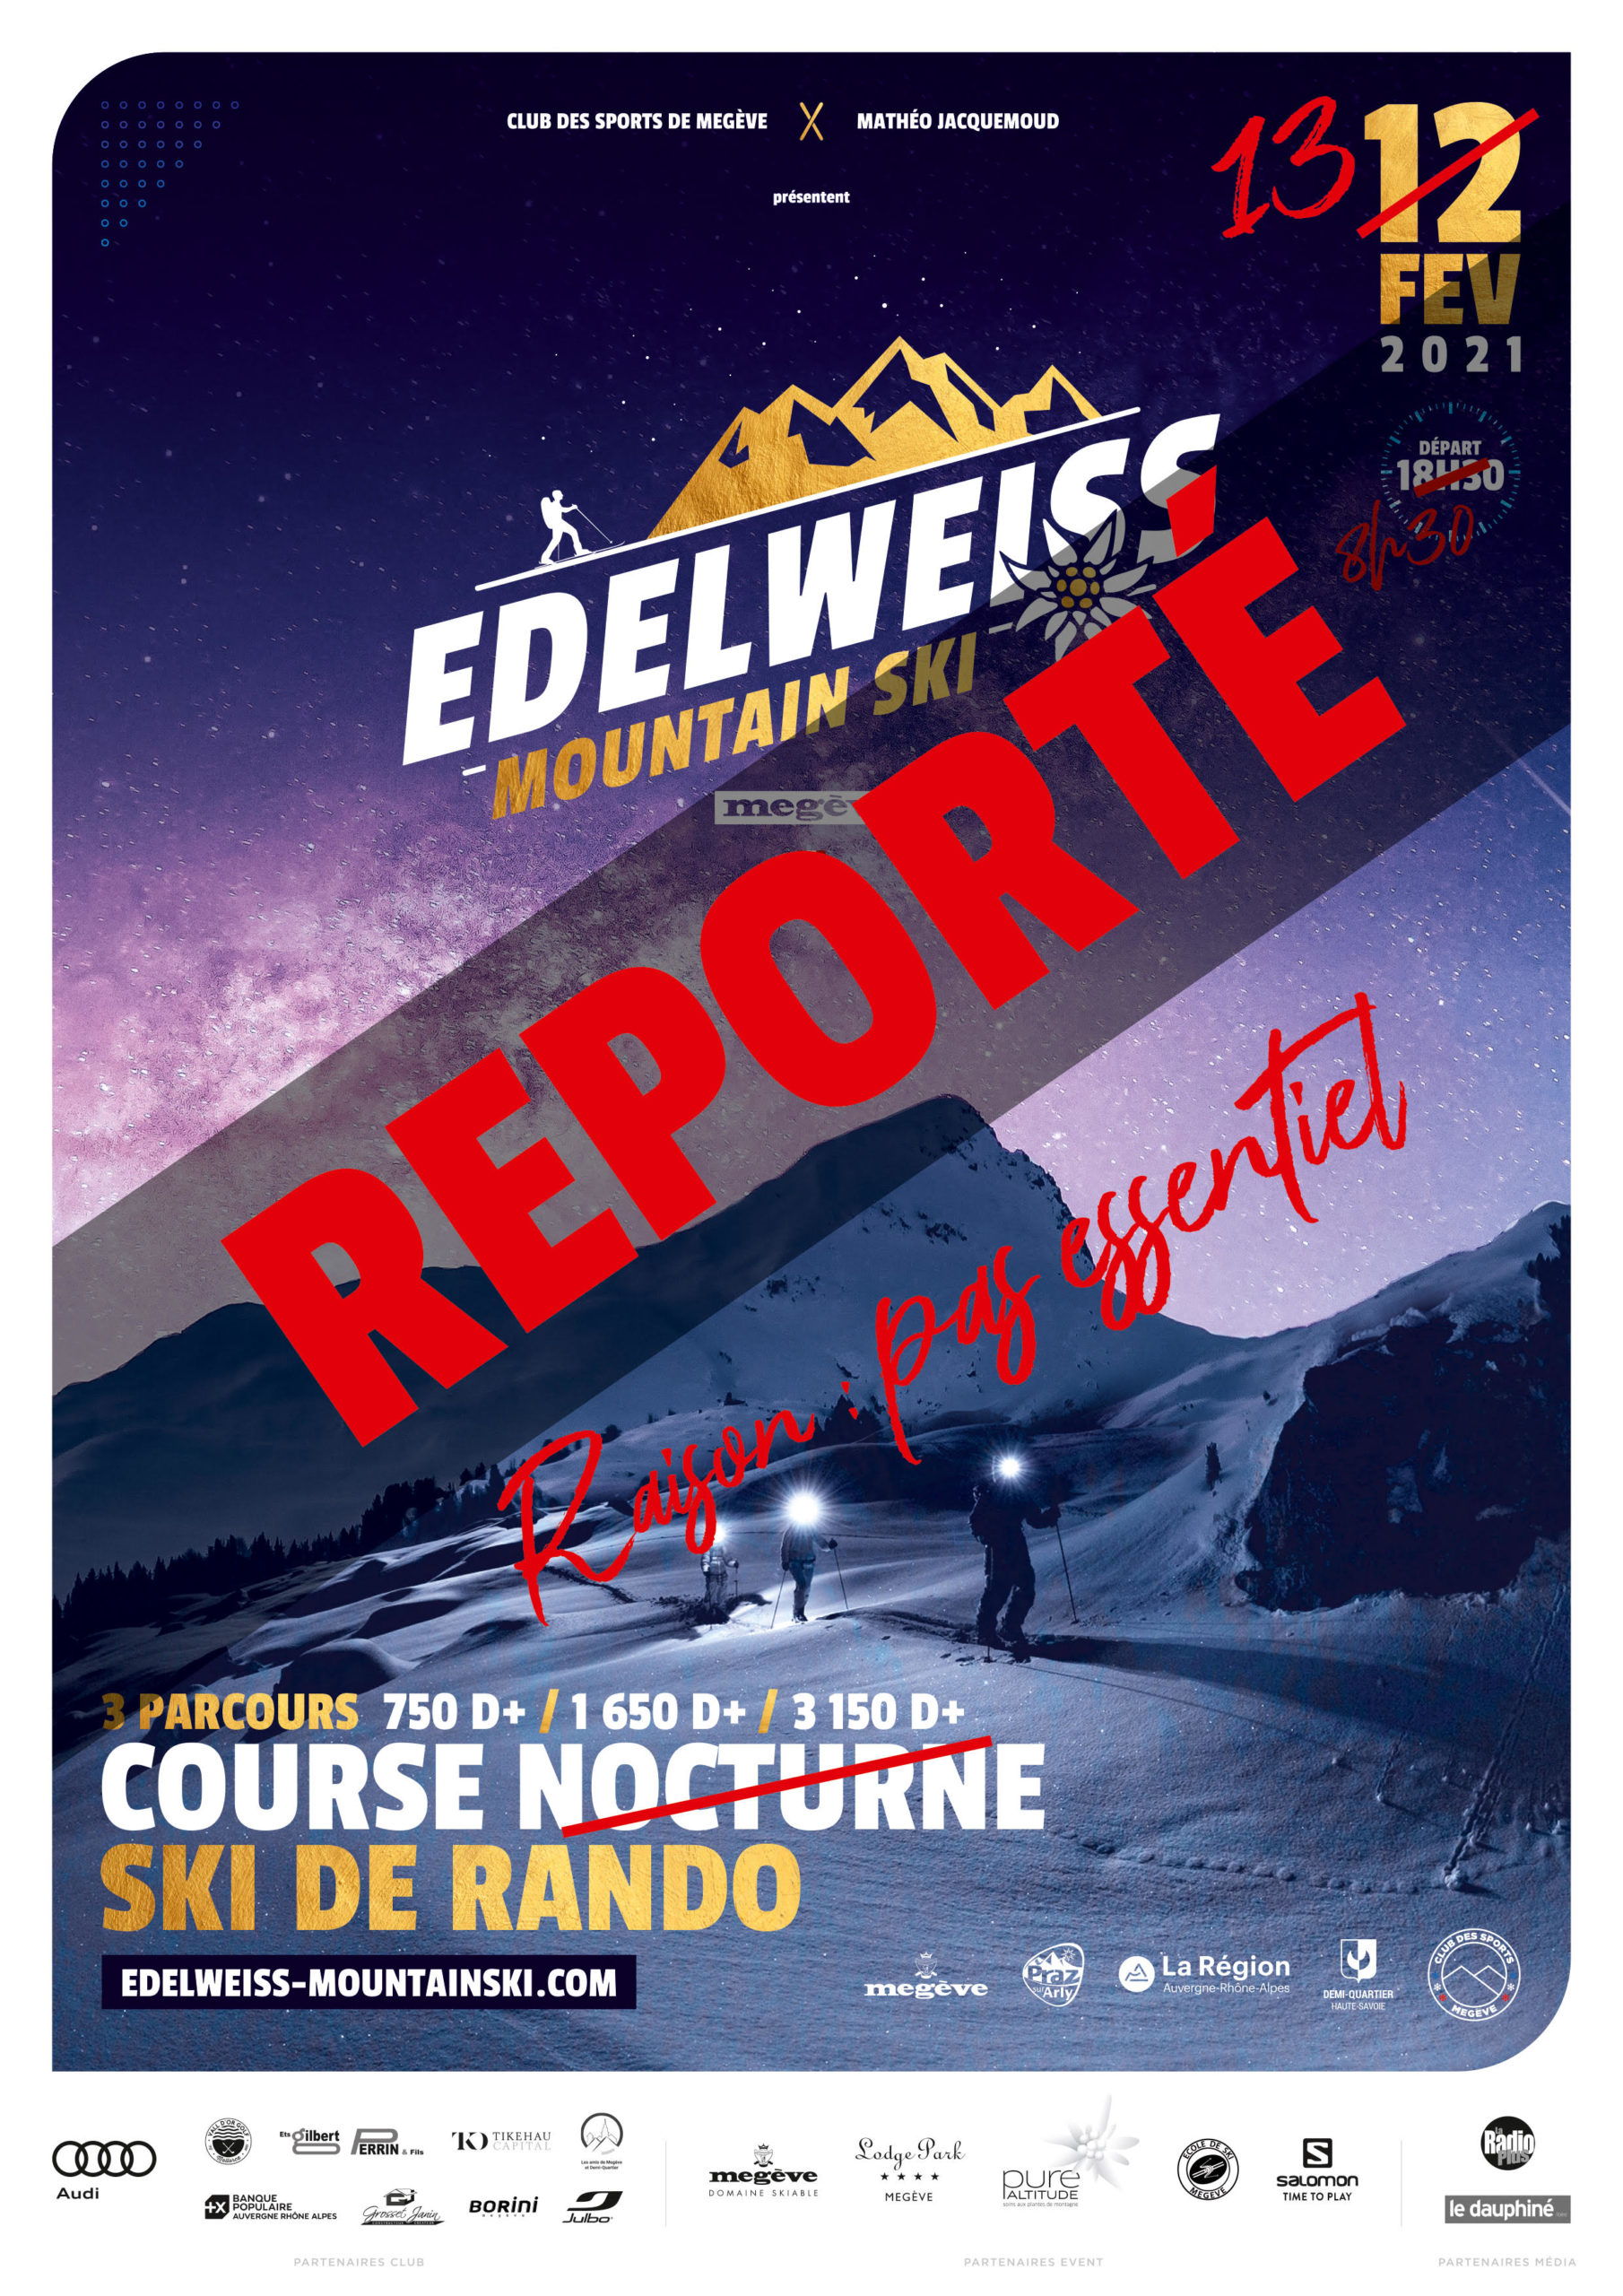 EDELWEISS 2021 : PAS ESSENTIEL